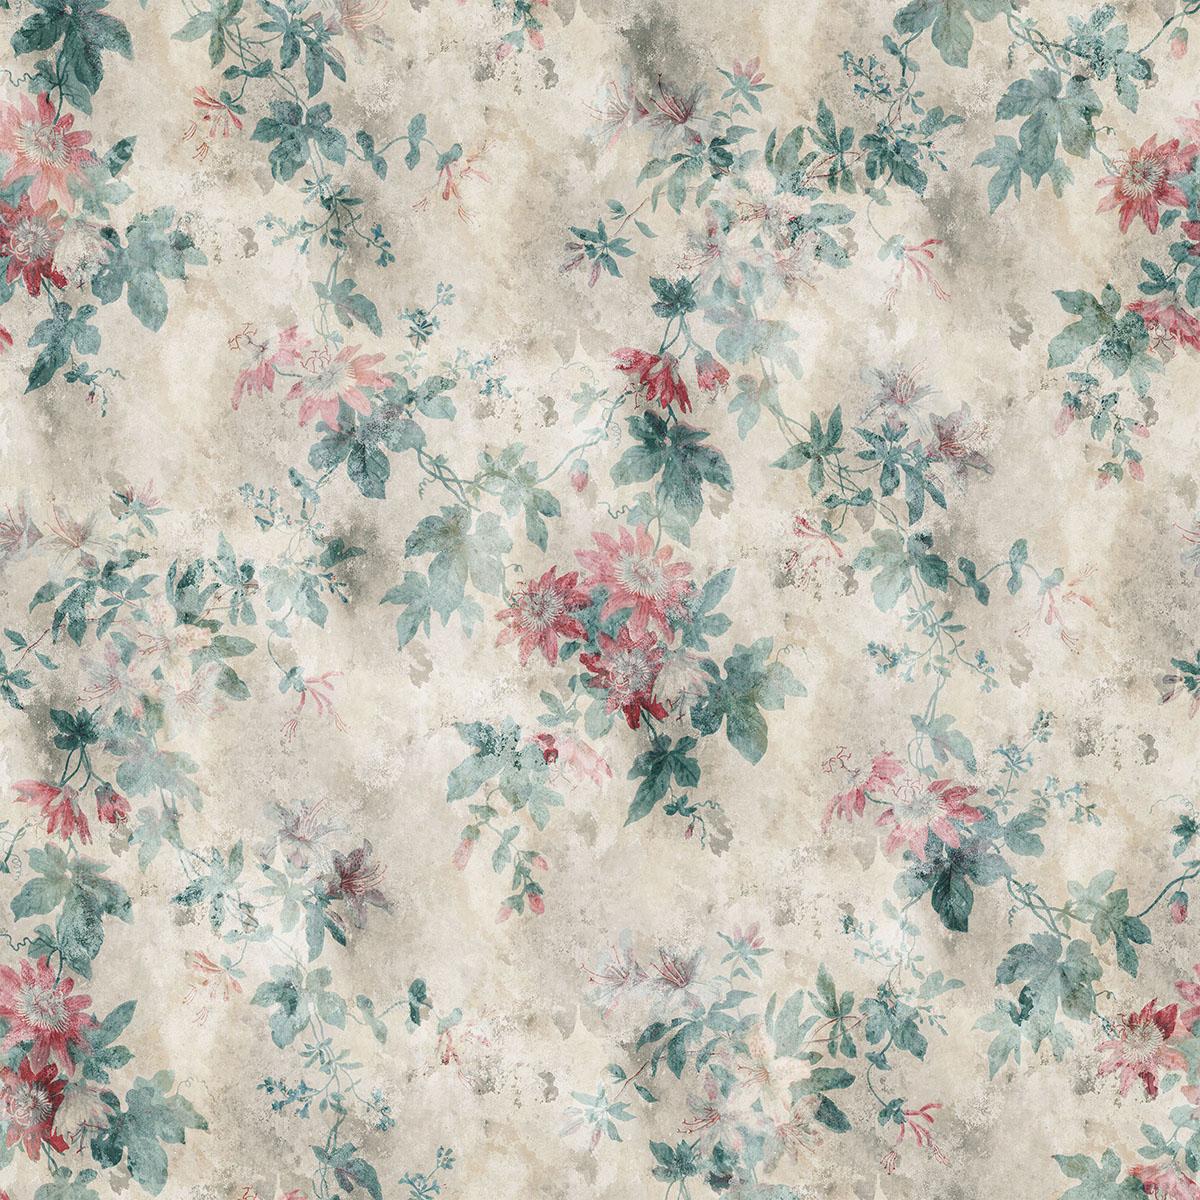 Tapet lavabil Faded Passion 623-06, Sandberg, 7.29mp / rola